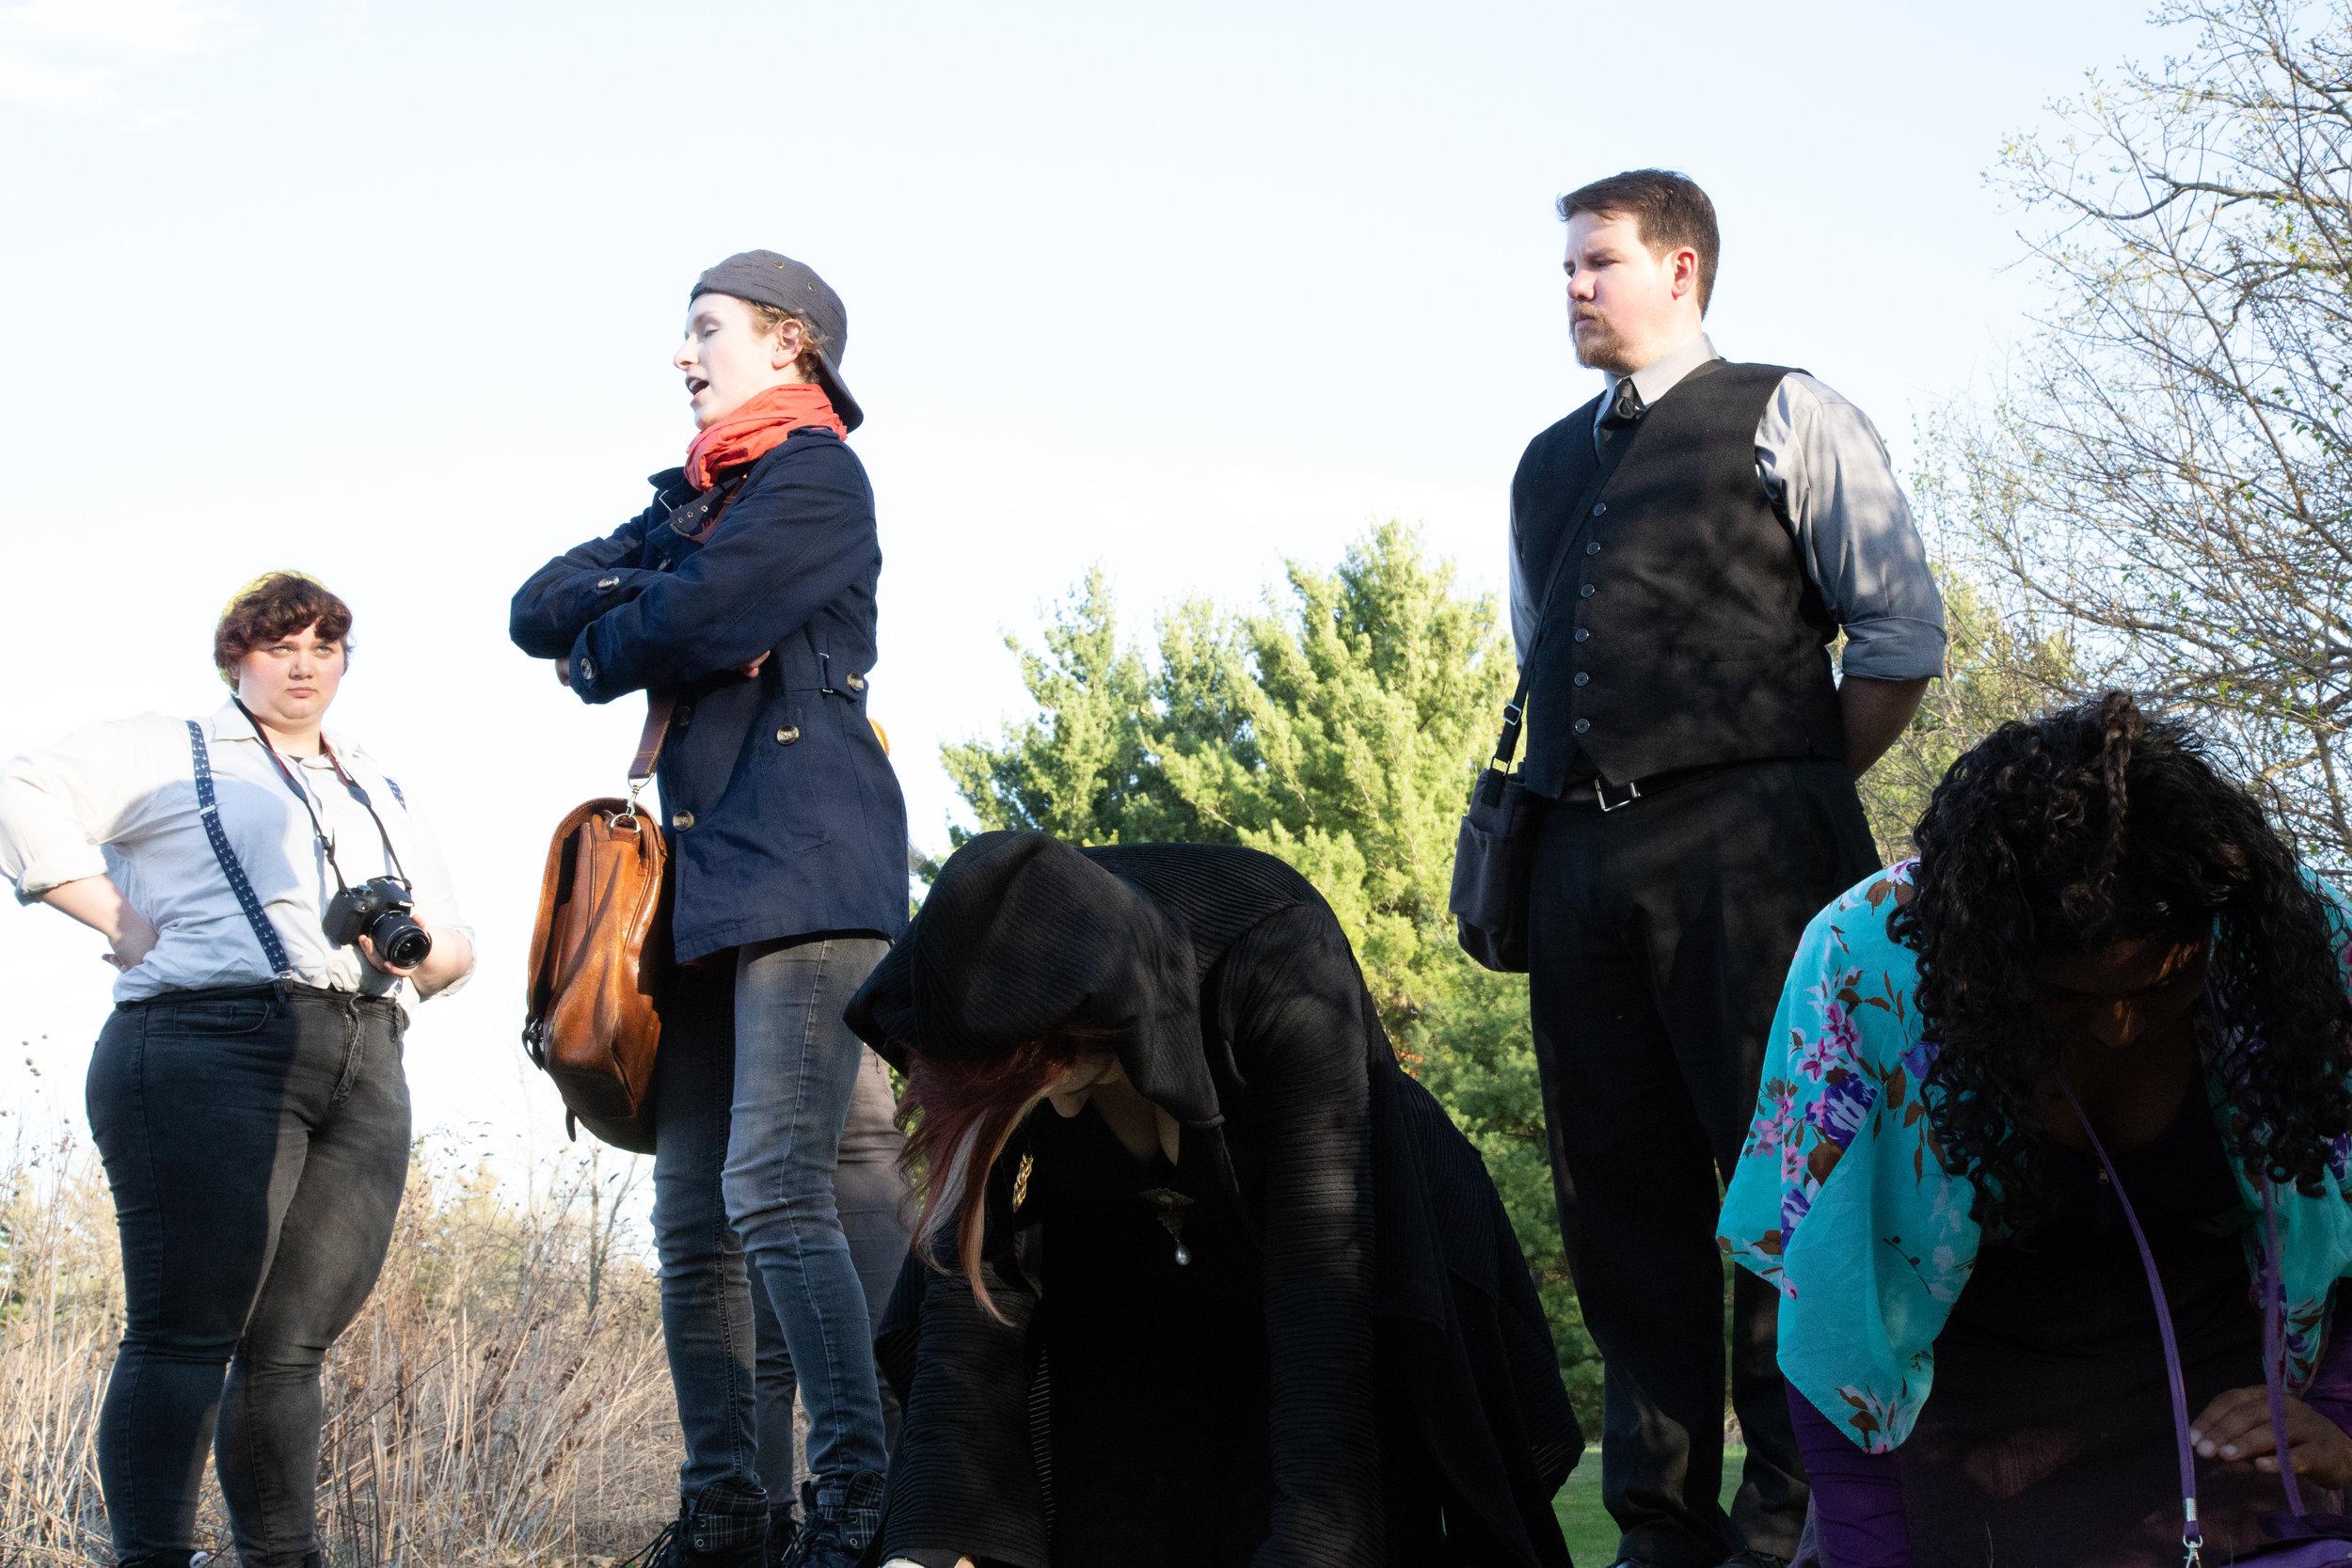 Heather (Nelly Ann Burkitt), Viola (Leah Christine) and Malvolio (Tom Sorenson) chat while Olivia (Kelli Tatum) and Maria (Tia Tanzer) practice yoga.